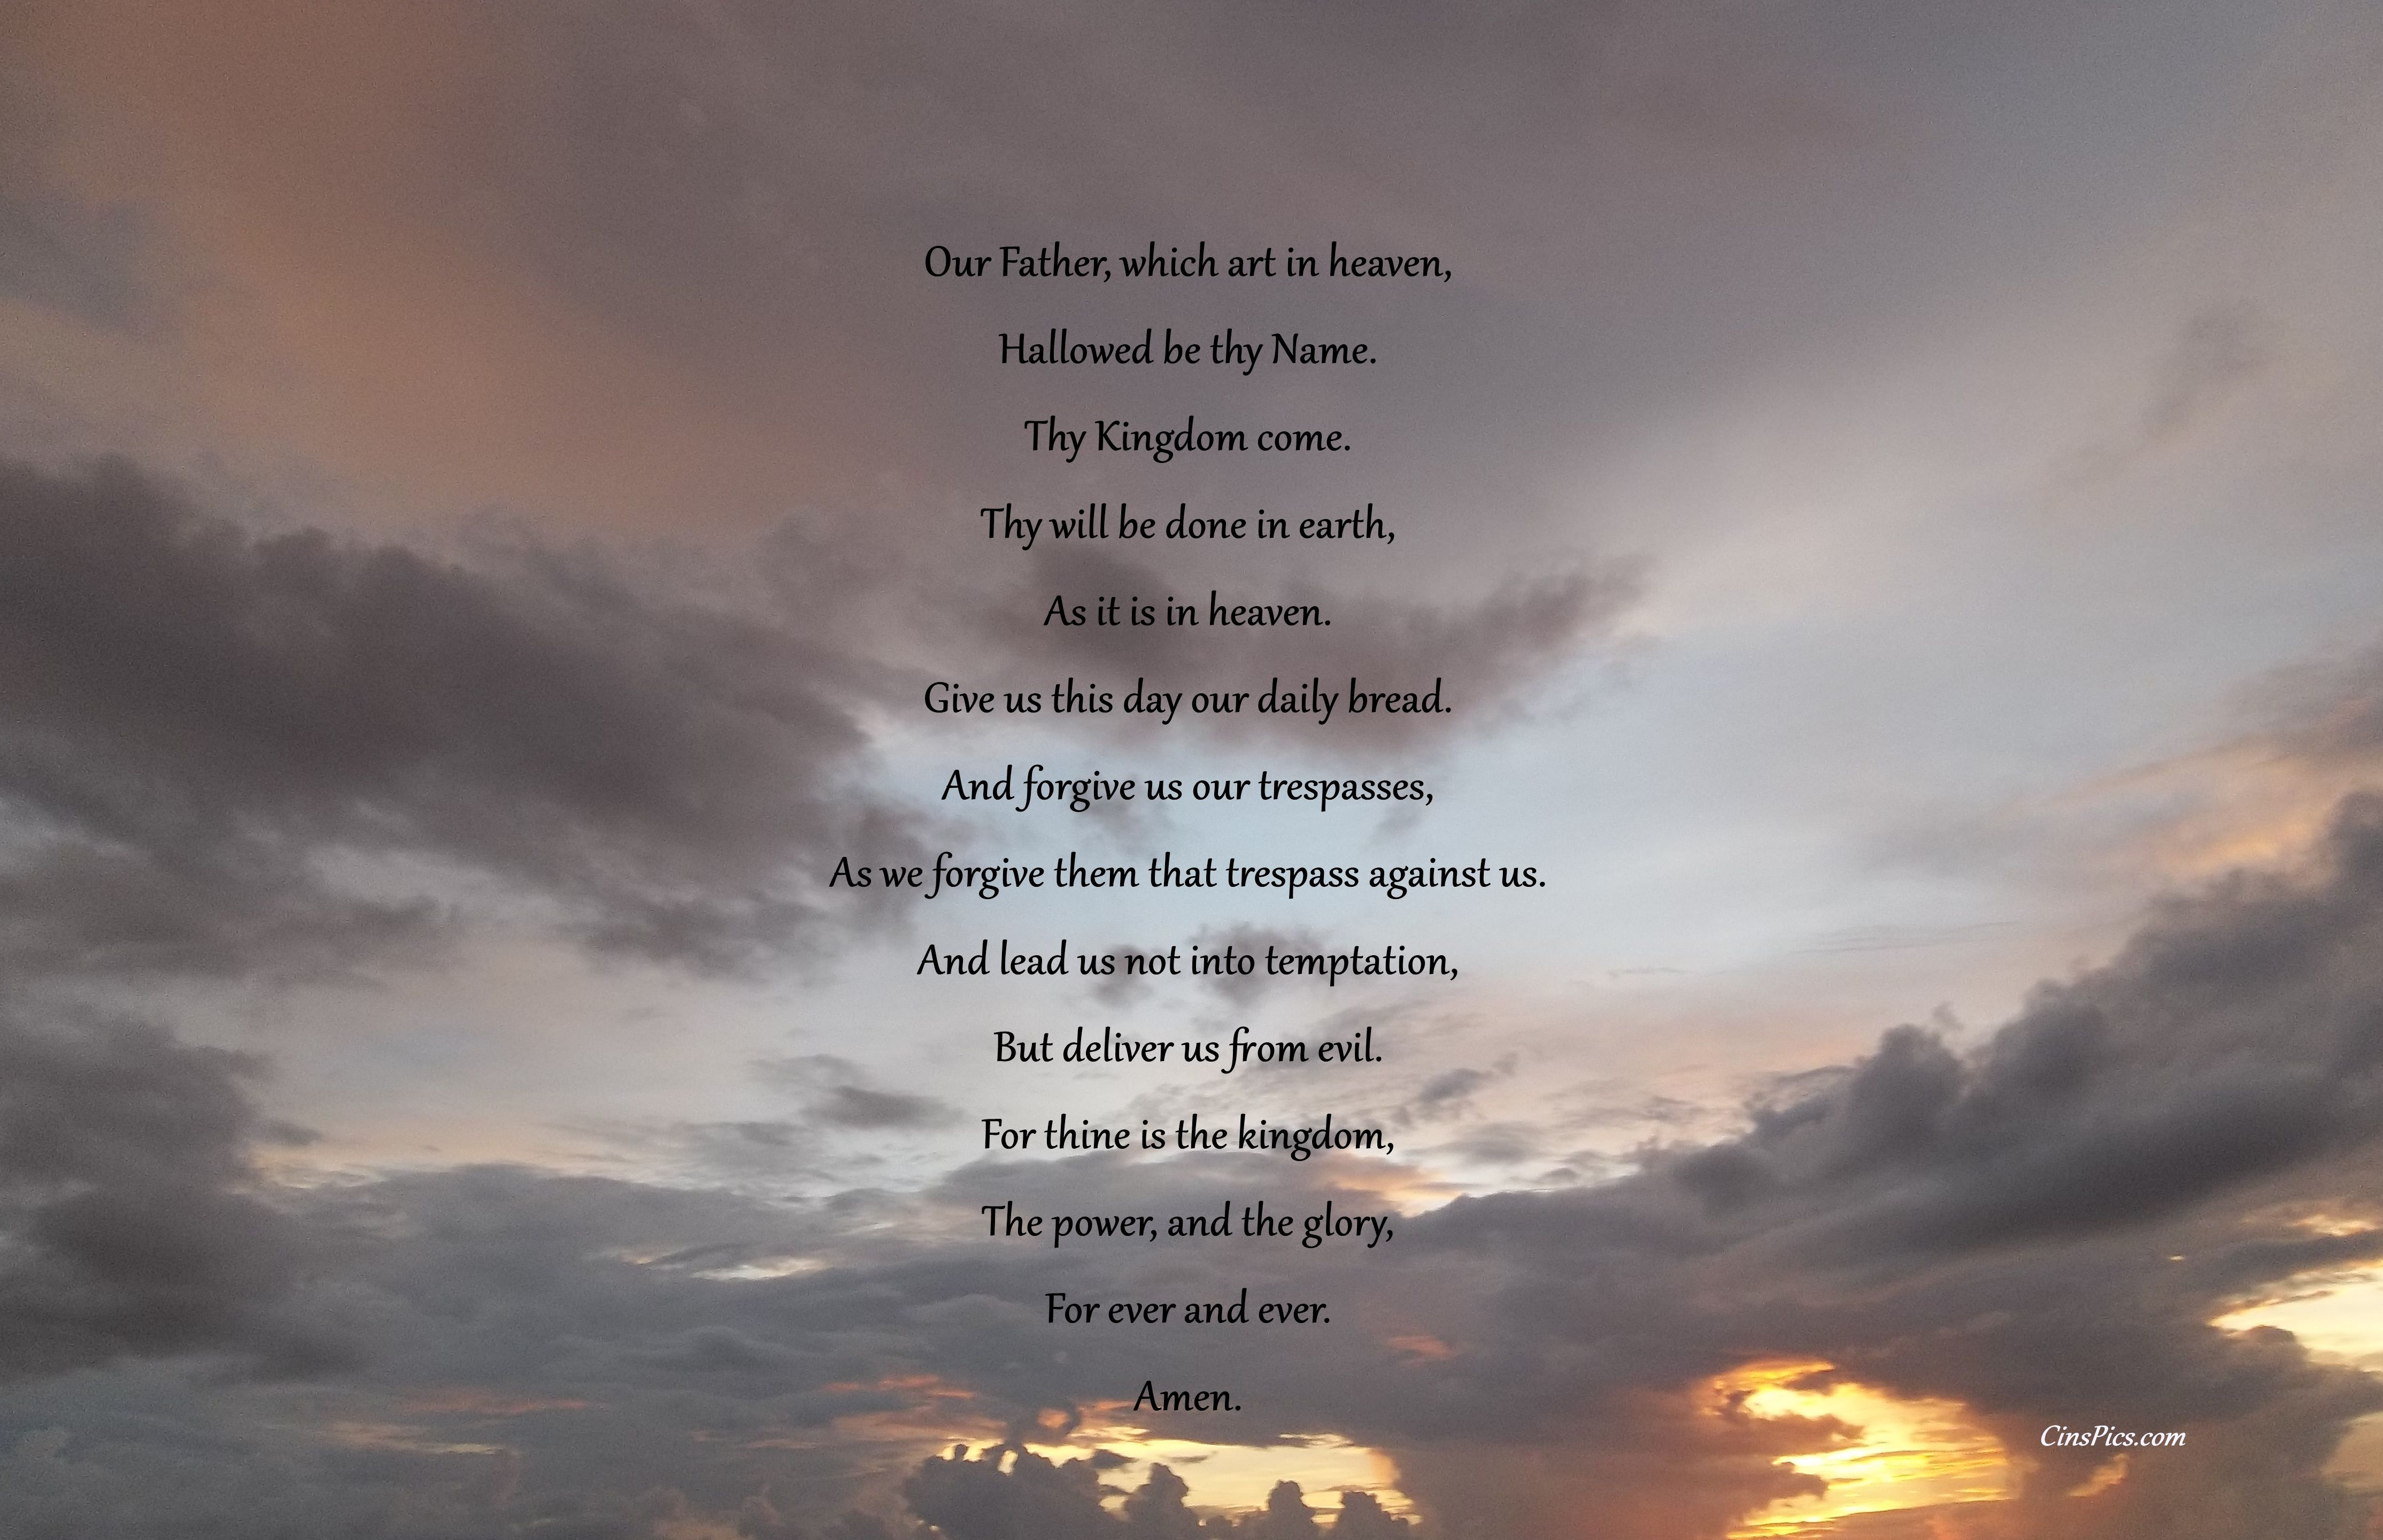 The Lords Prayer 8 x 10 Etsy The lords prayer, Prayers